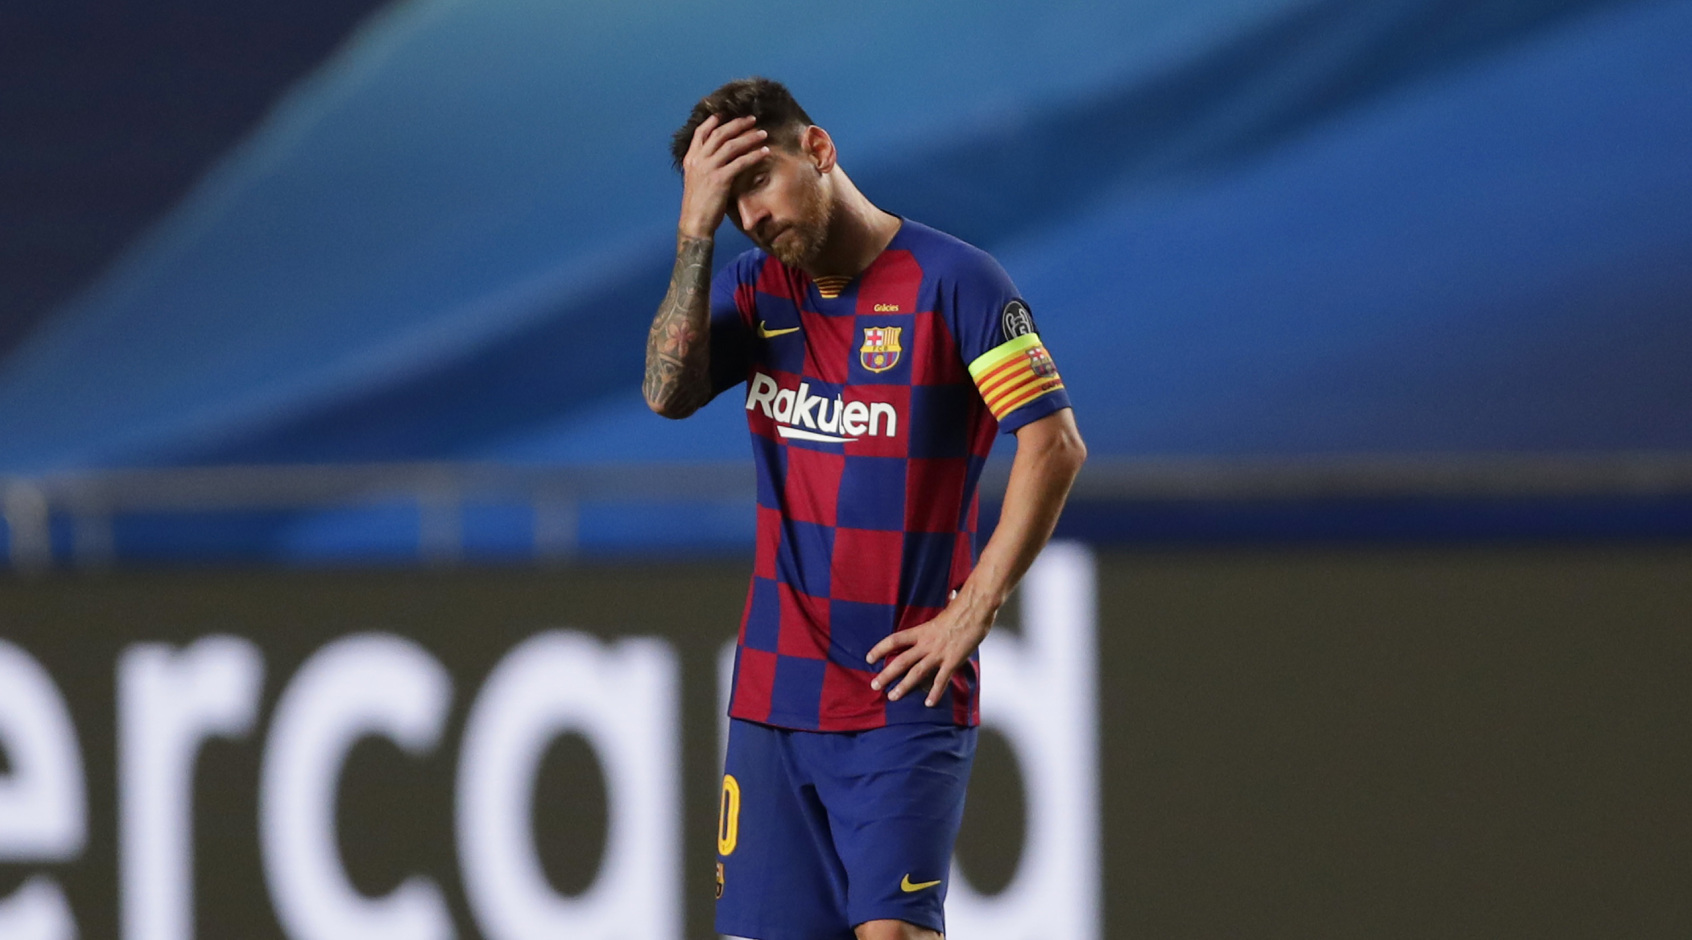 Месси забил один гол со штрафного за последние 45 попыток